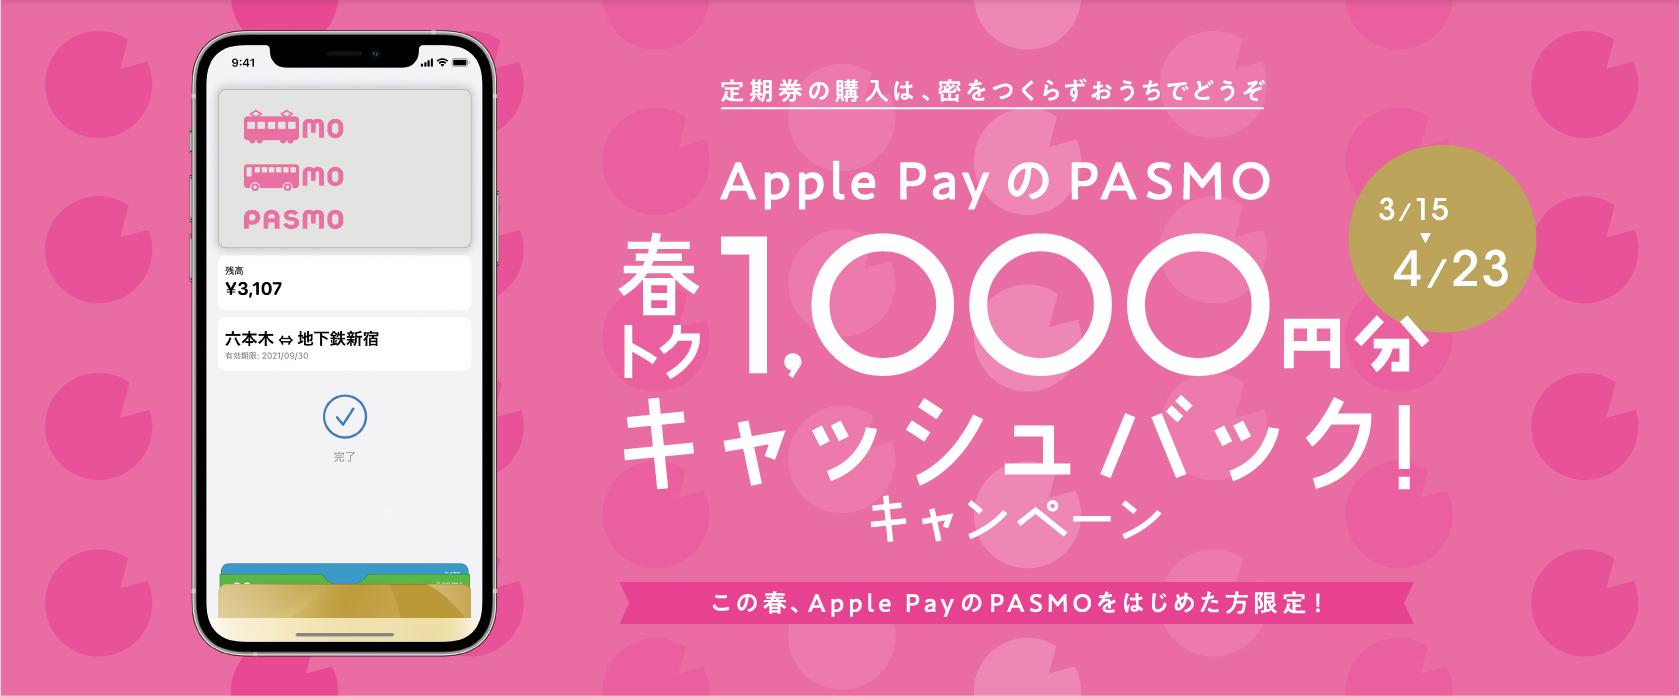 ApplePayでPASMOを始めて5000円以上使うと、1000円分キャッシュバック。3/15~4/23。